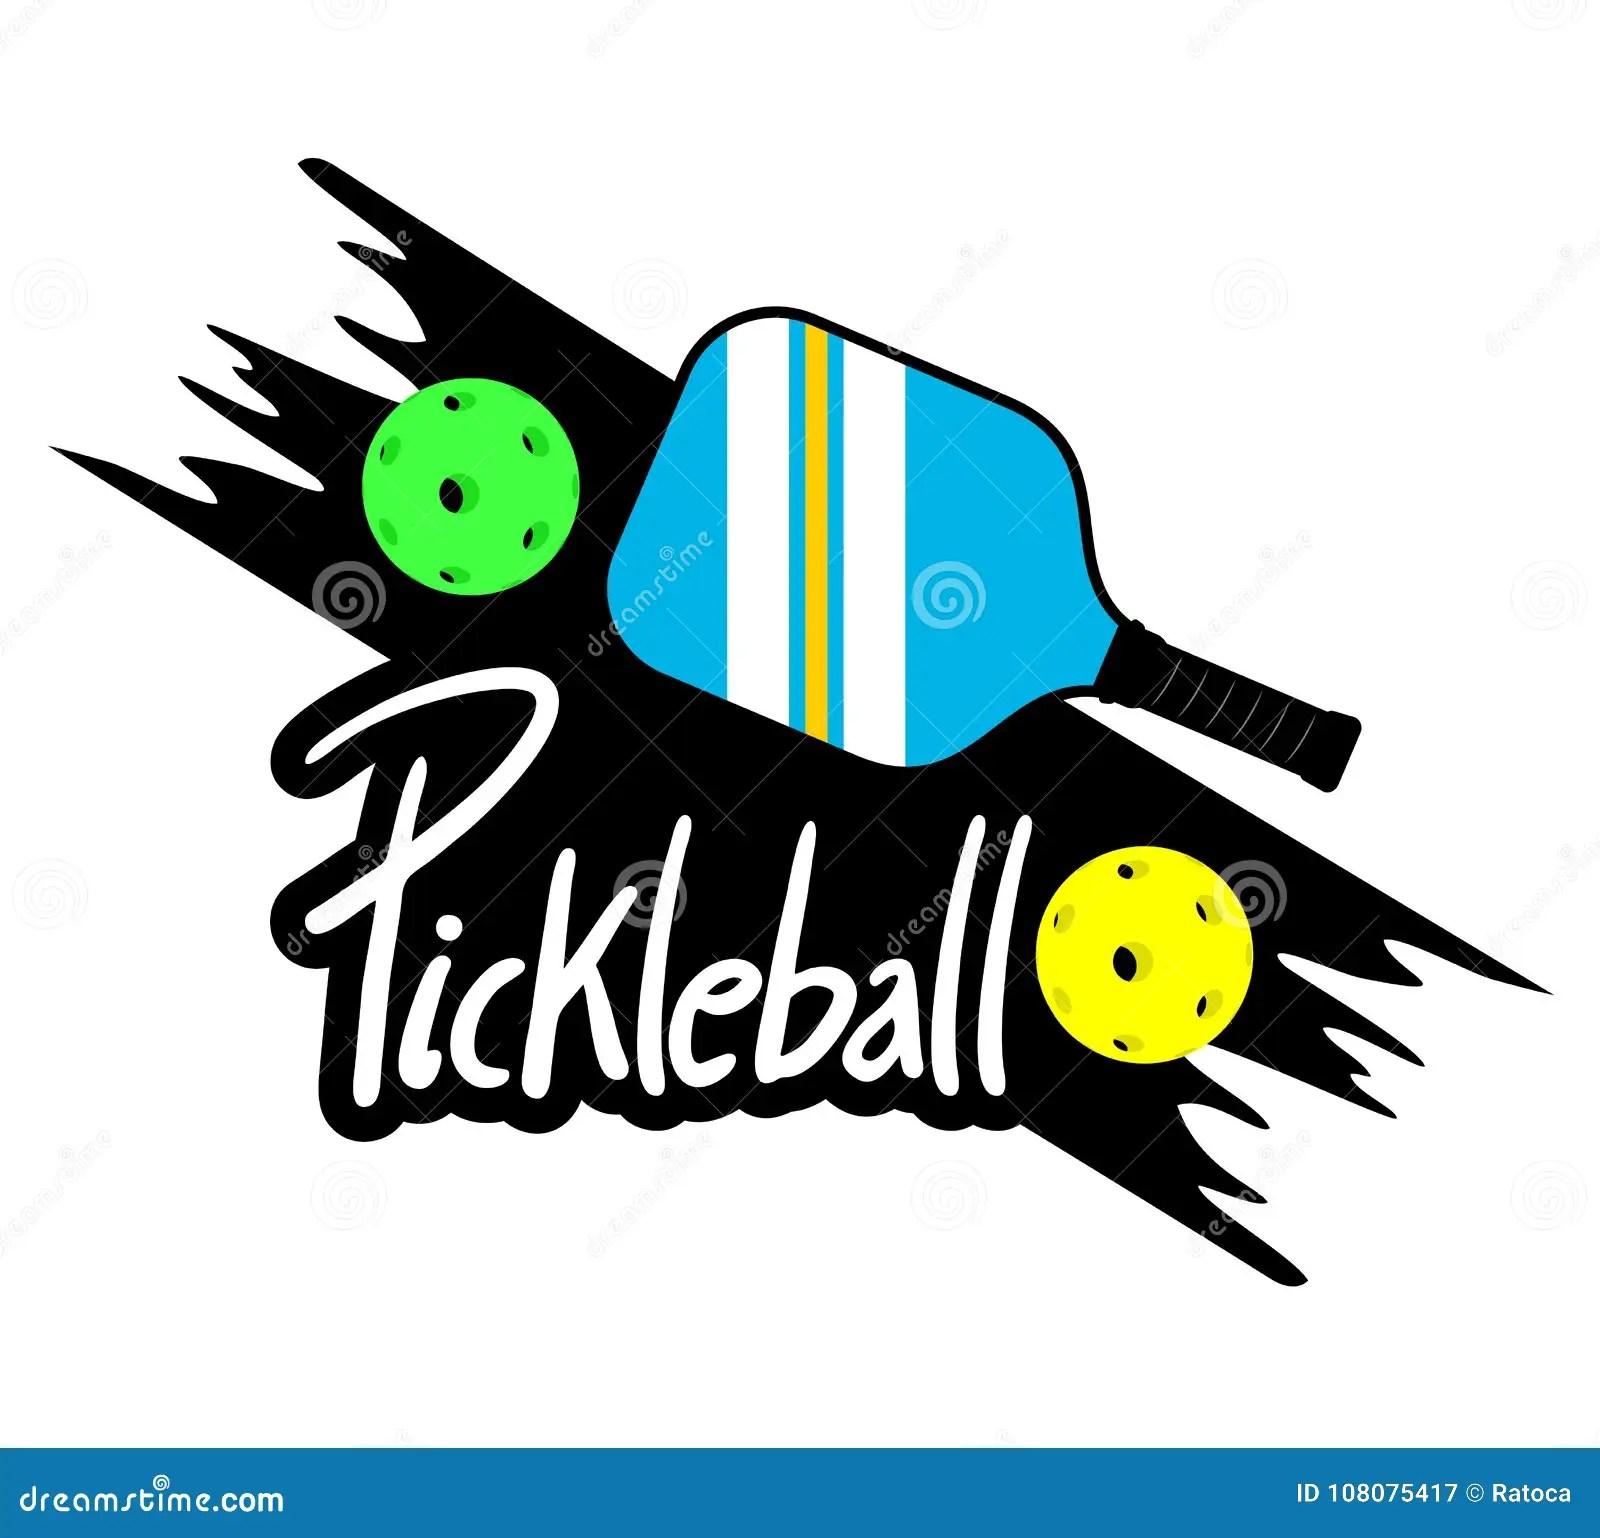 hight resolution of pickleball racket stock illustrations 216 pickleball racket stock illustrations vectors clipart dreamstime